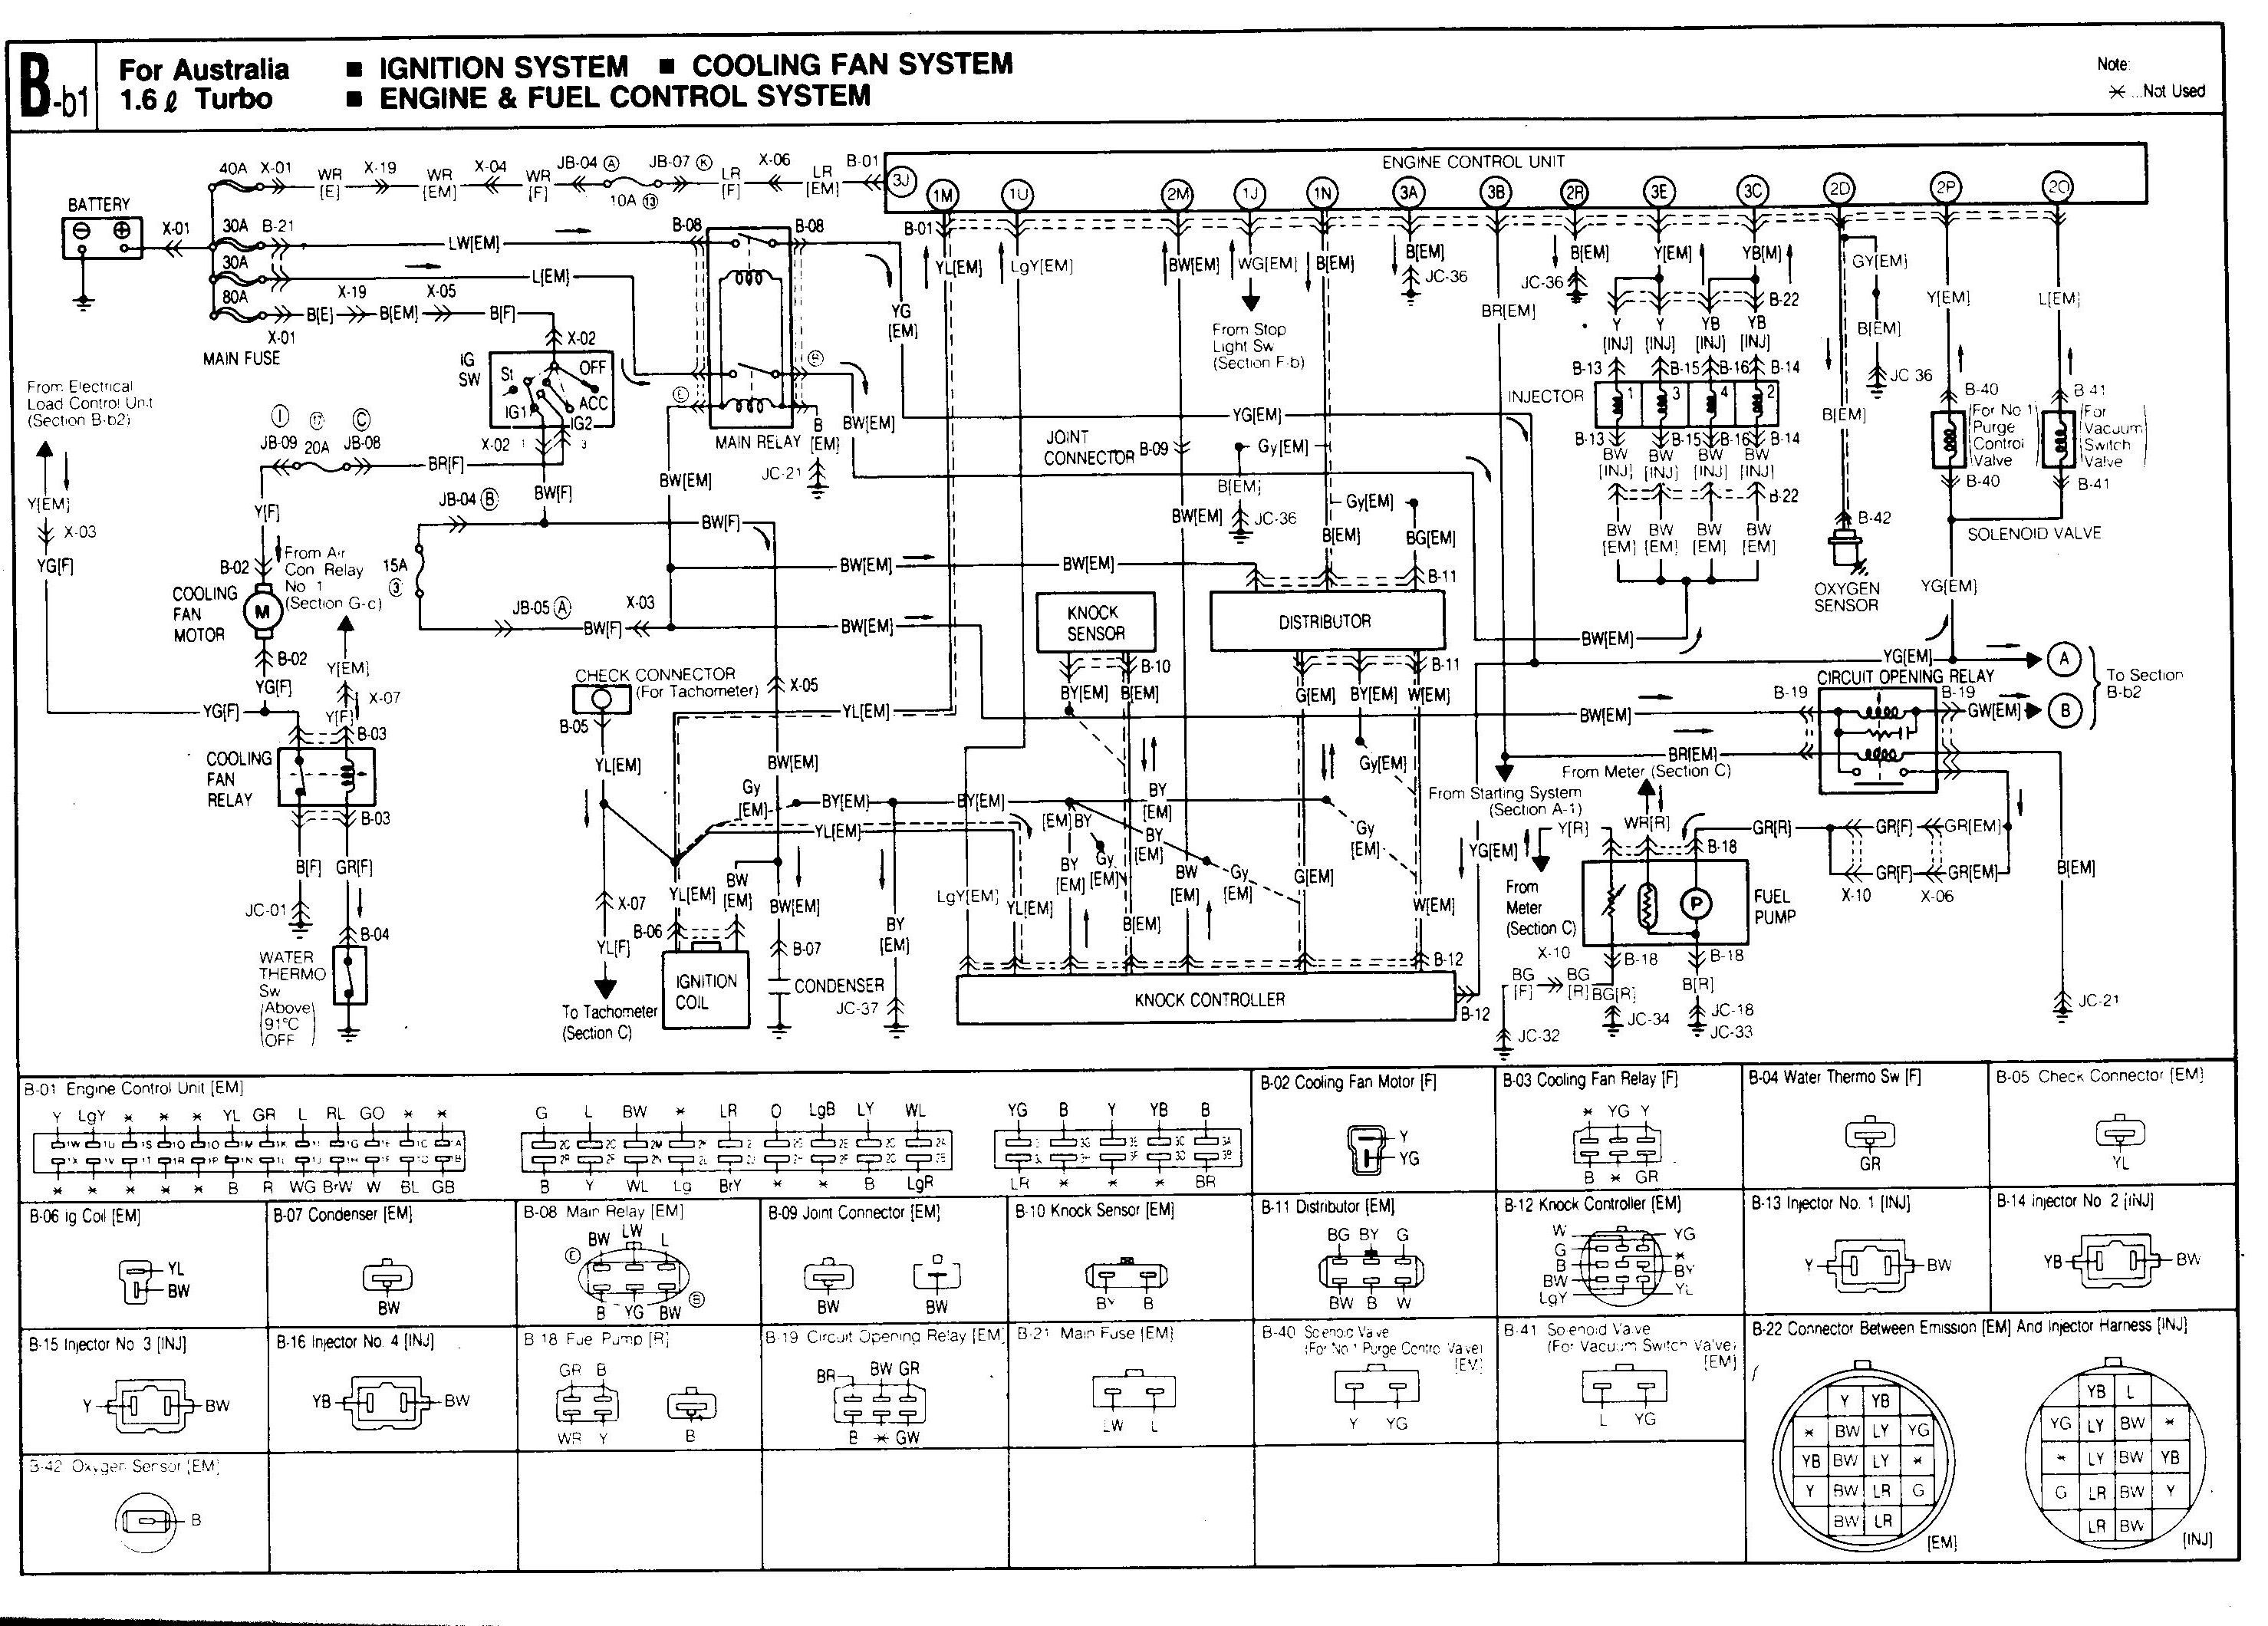 mazda gf wiring diagram with basic pics 626 mazda pinterest rh pinterest com 2002 mazda 626 engine diagram 1995 mazda 626 fuse diagram [ 2957 x 2120 Pixel ]